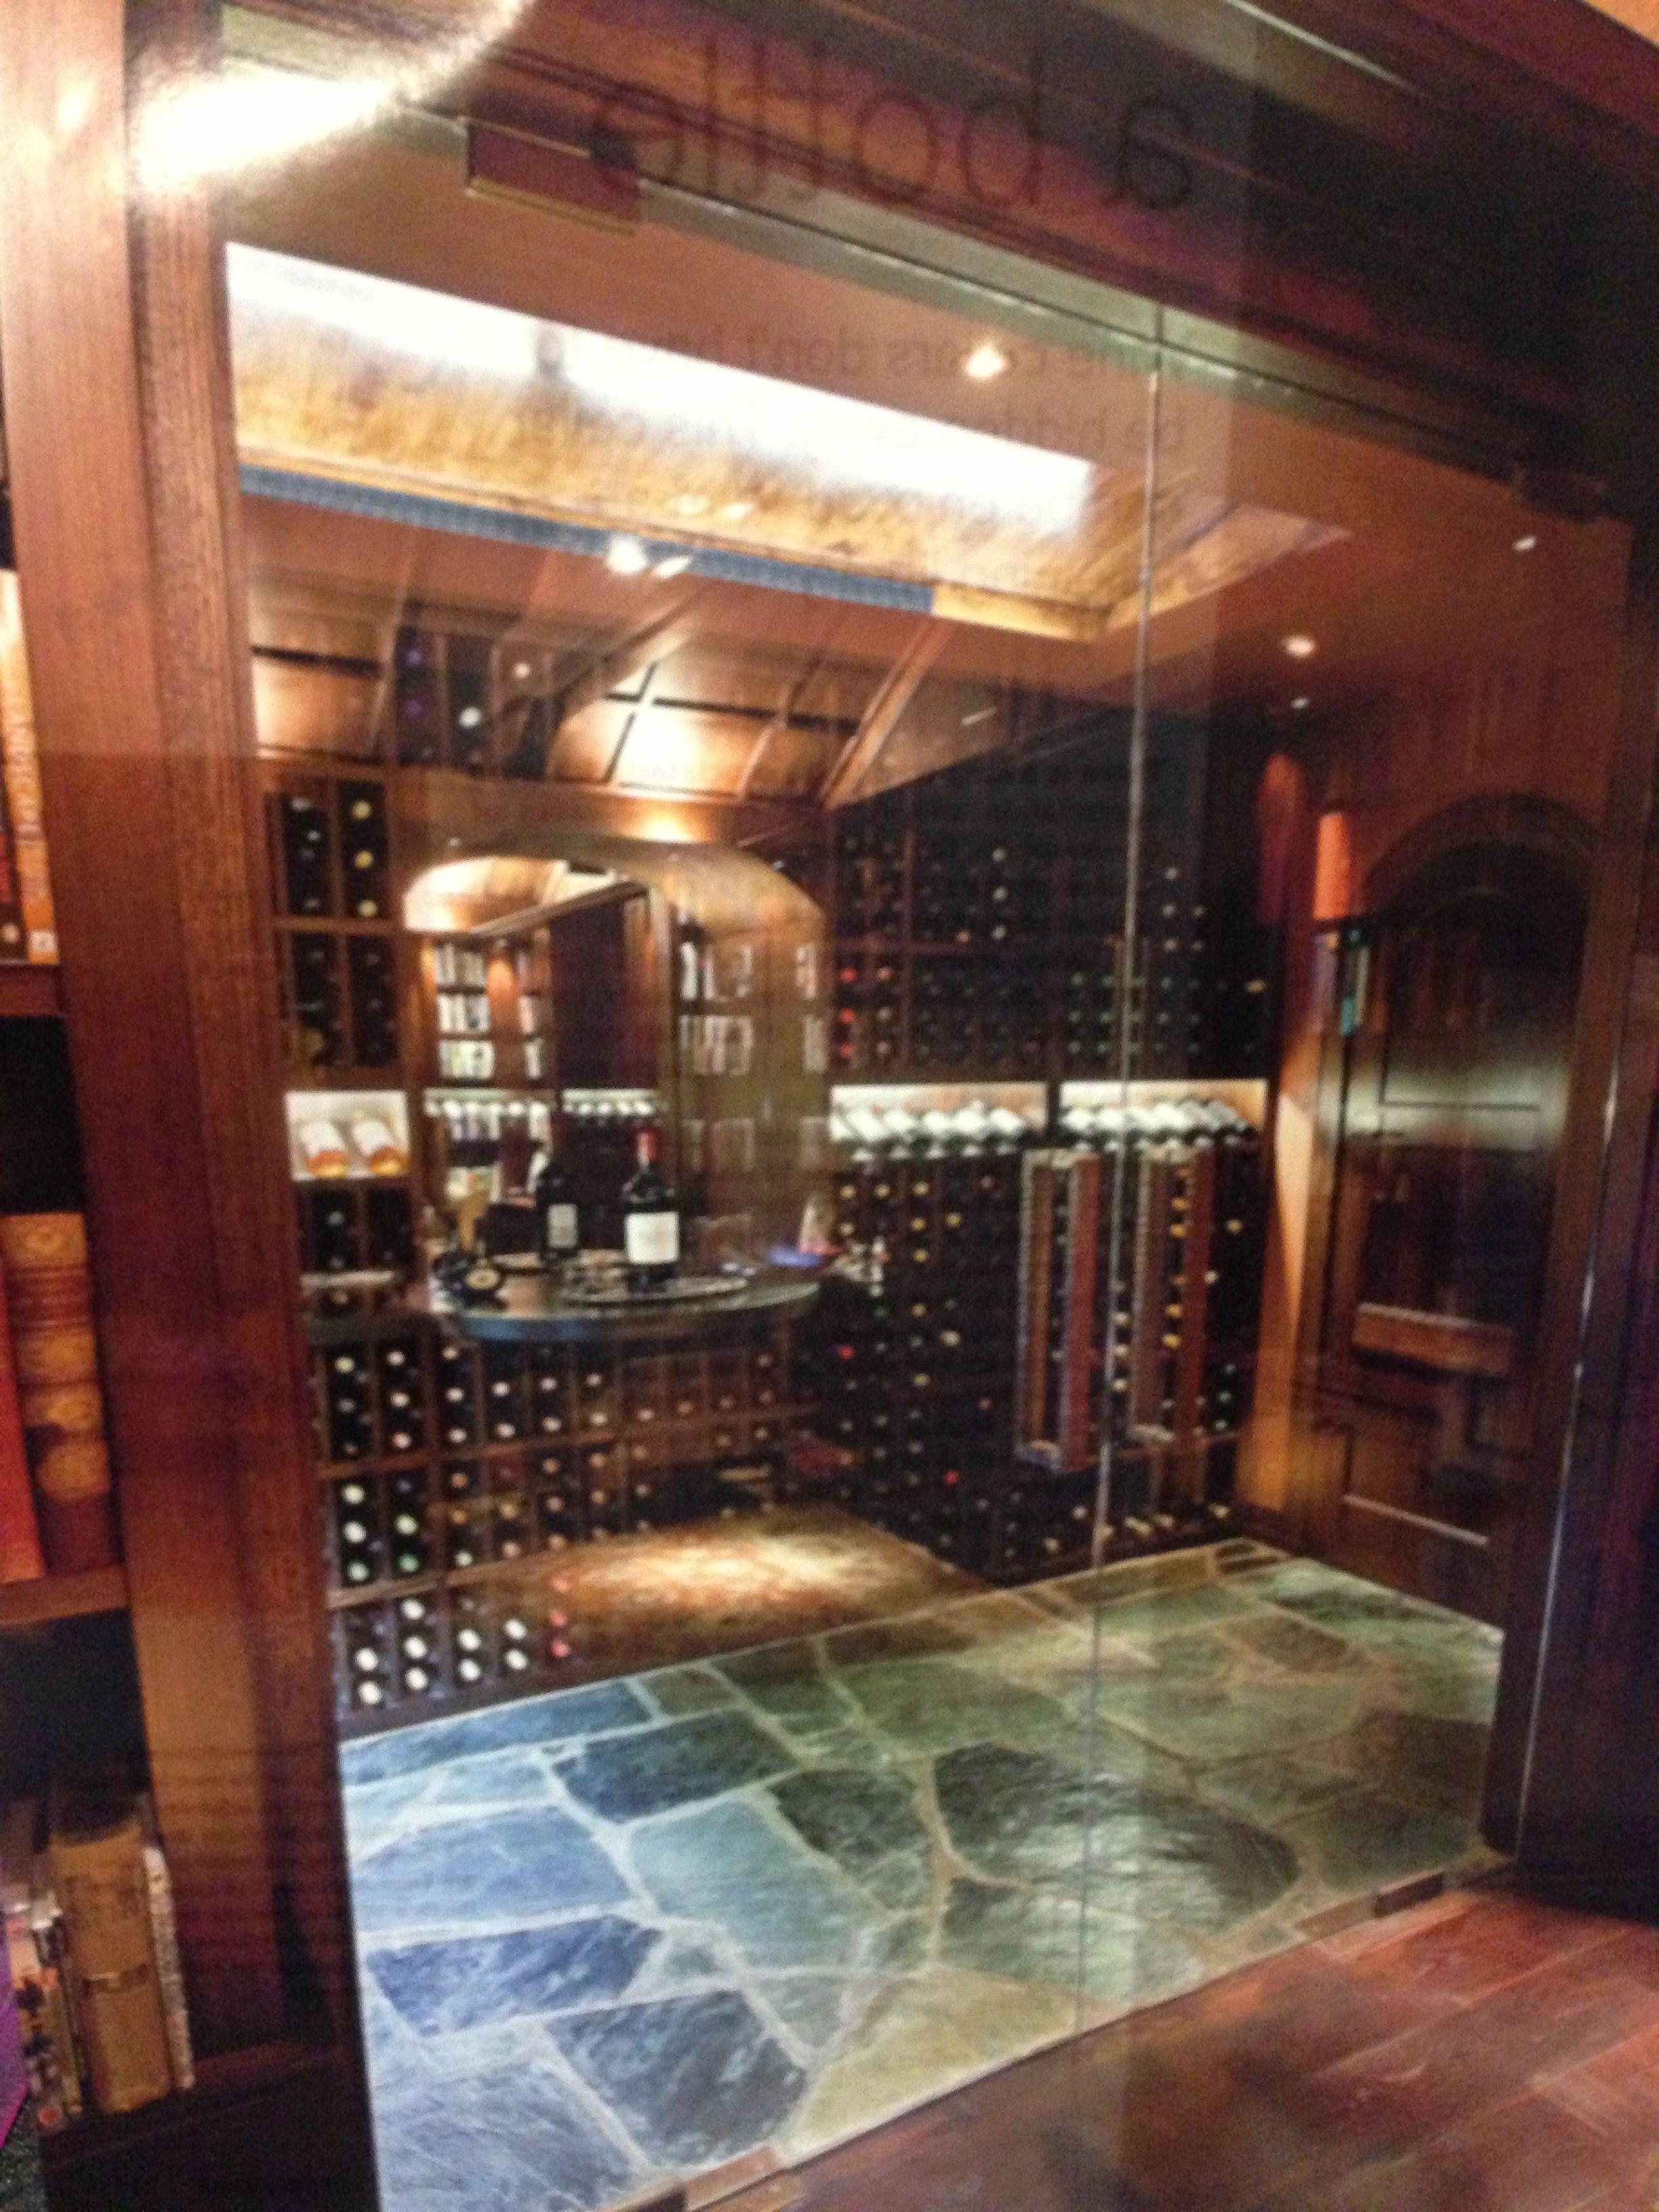 Over 100 Man Cavewine Cellar Design Ideas Httpwwwpinterestcomnjestatesman Cave Wine Cellar Ideas Thanks To